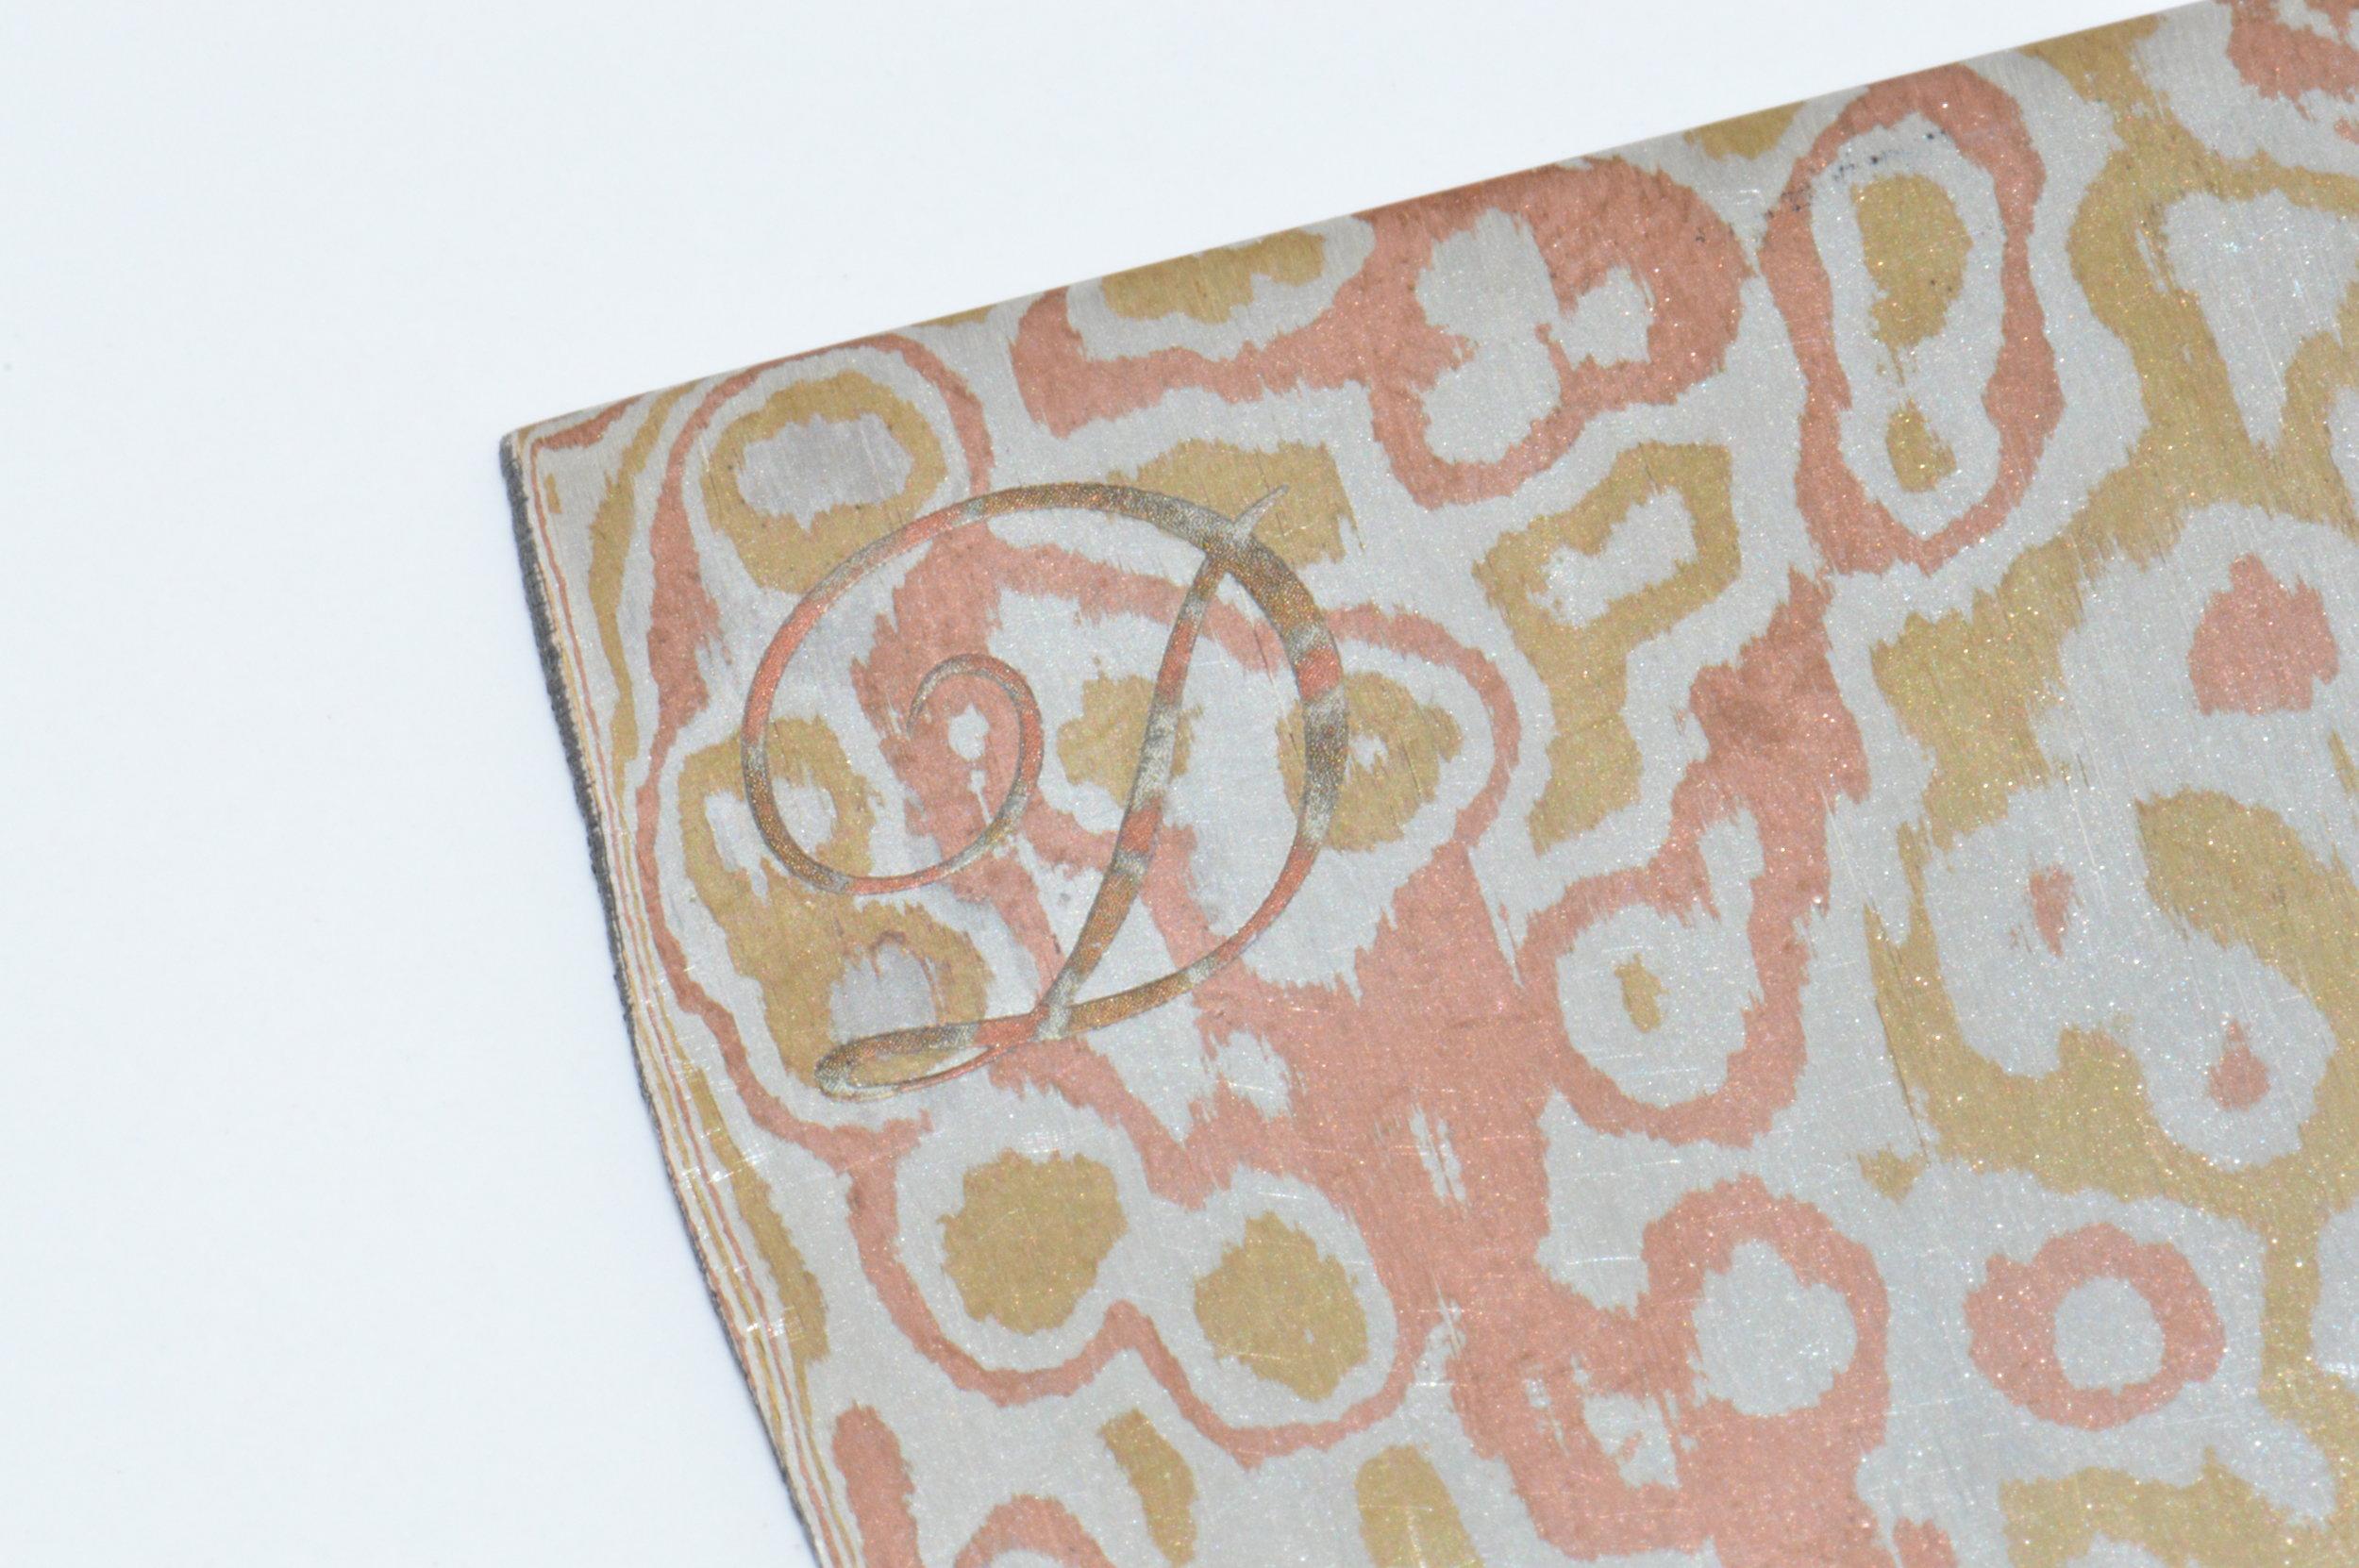 darvier-hallmark-test-engraving-mokume-sheet.JPG